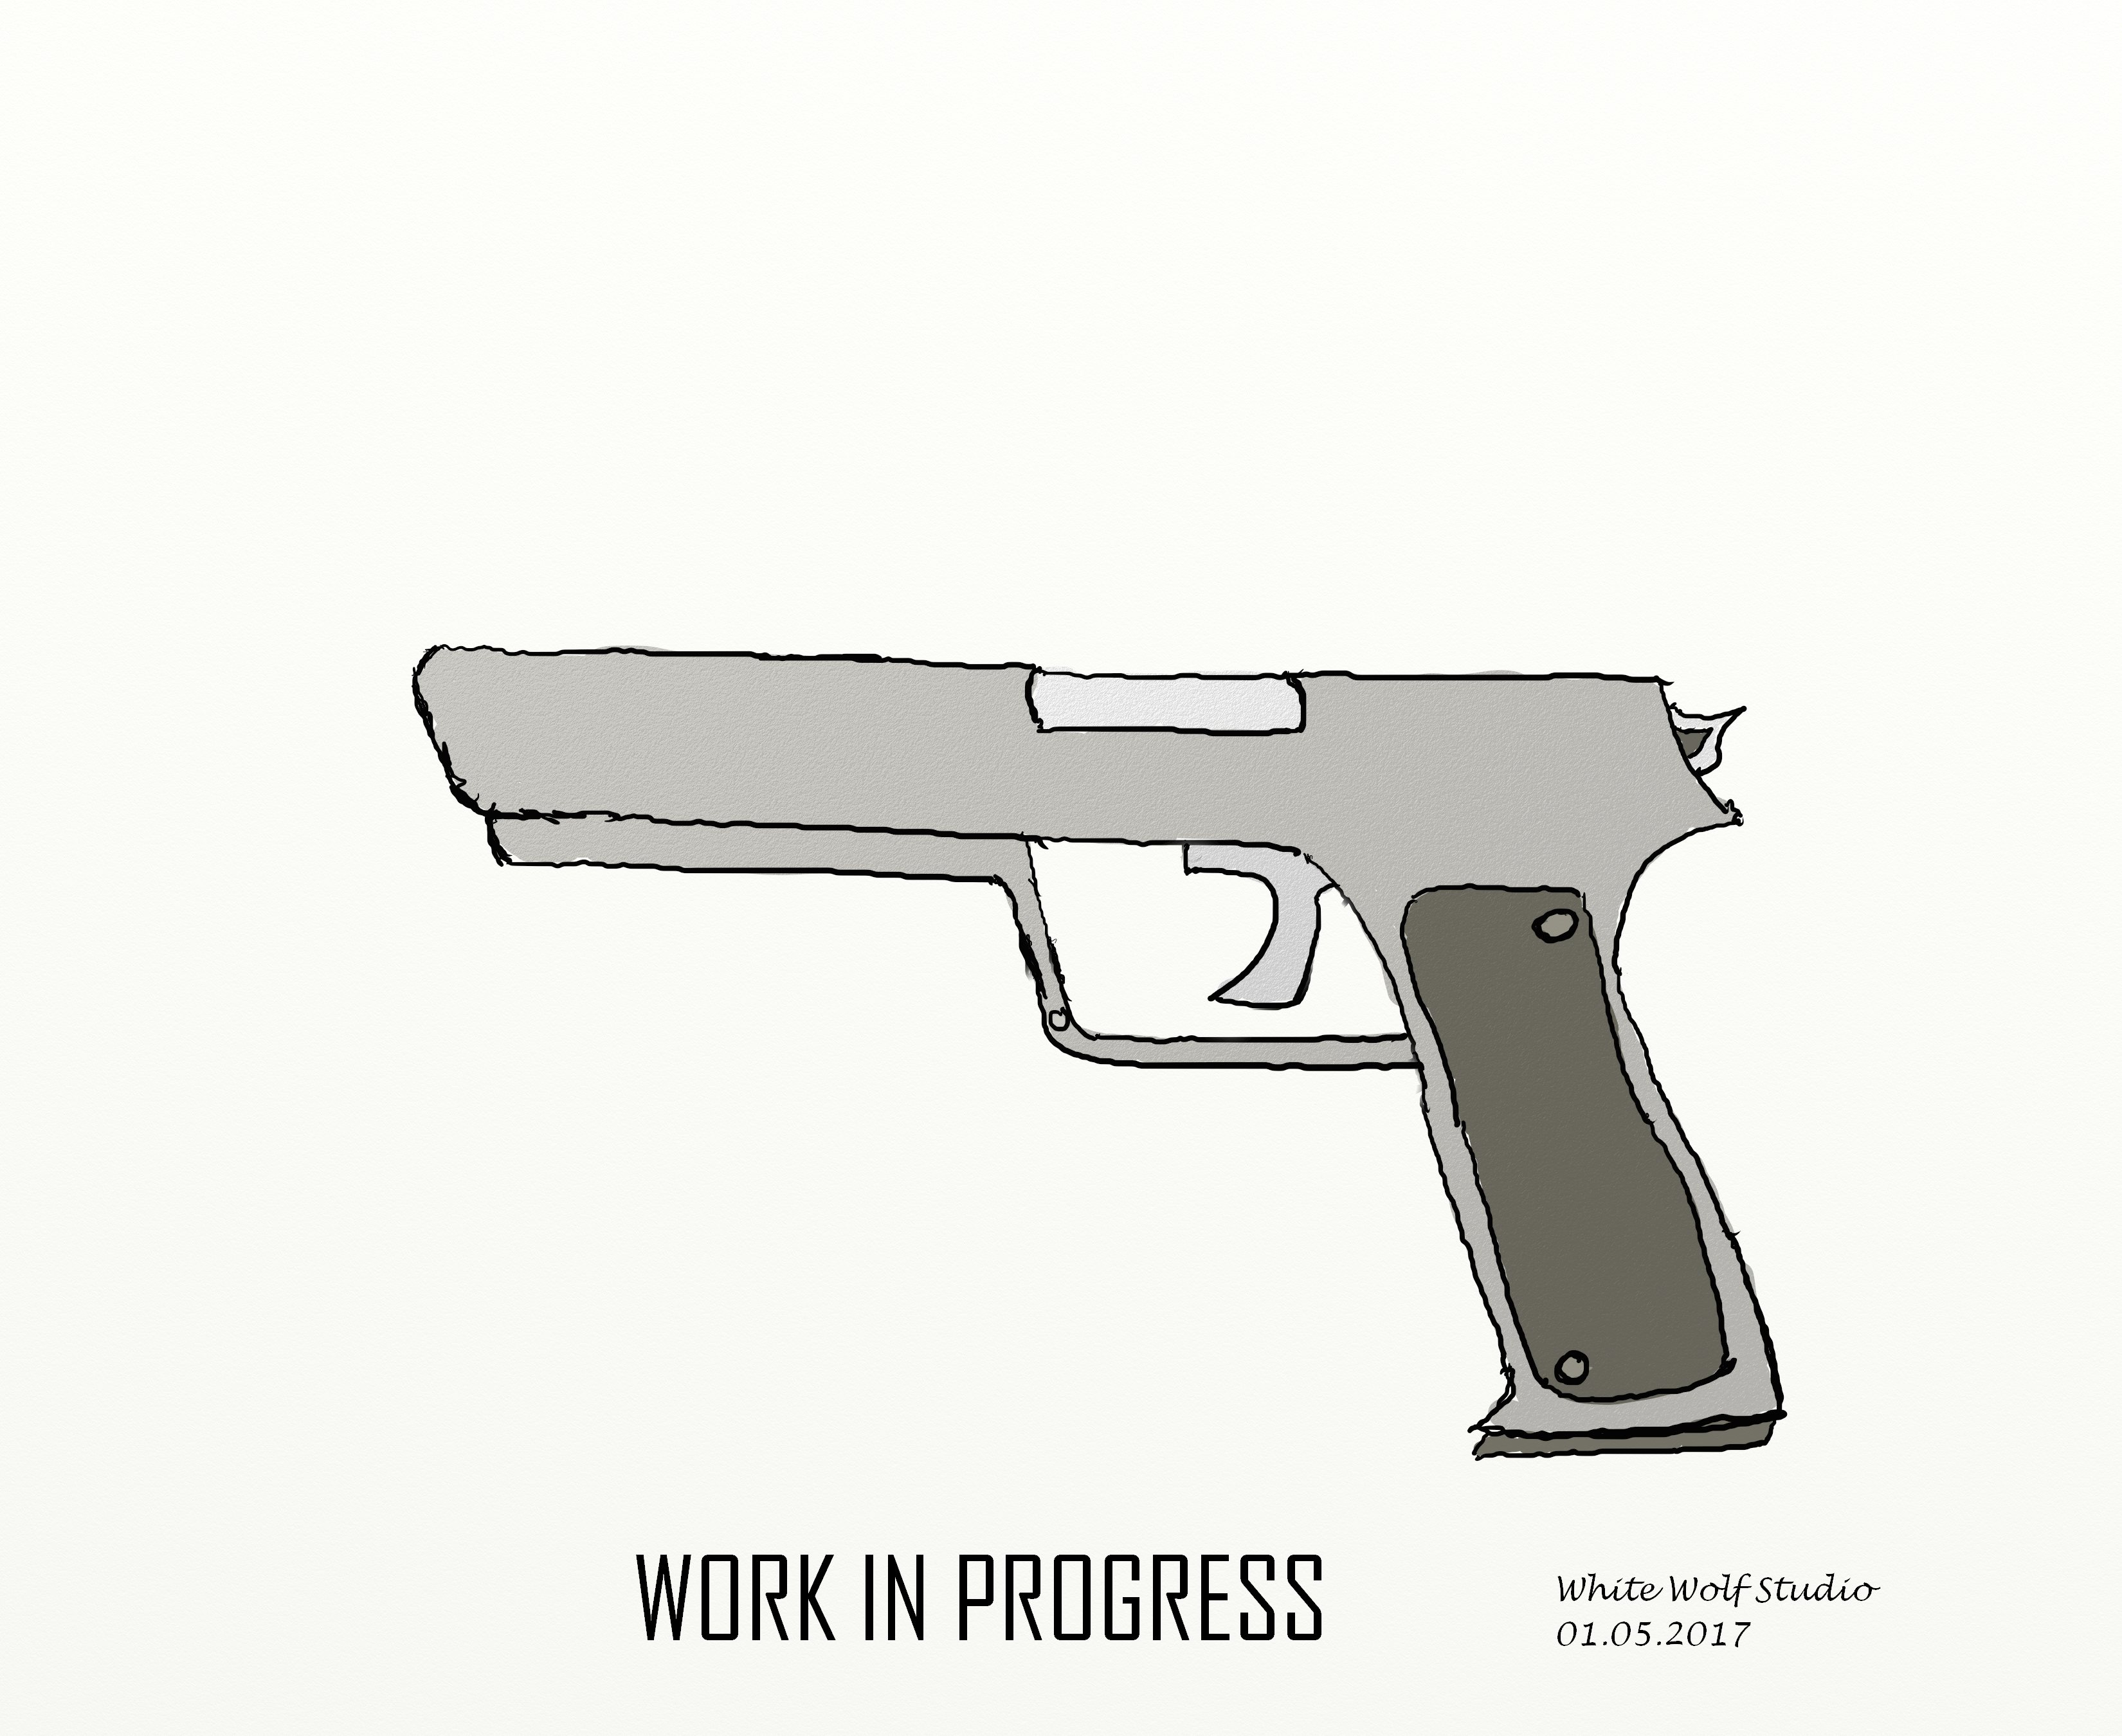 [Work in Progress] Guns - Pistol